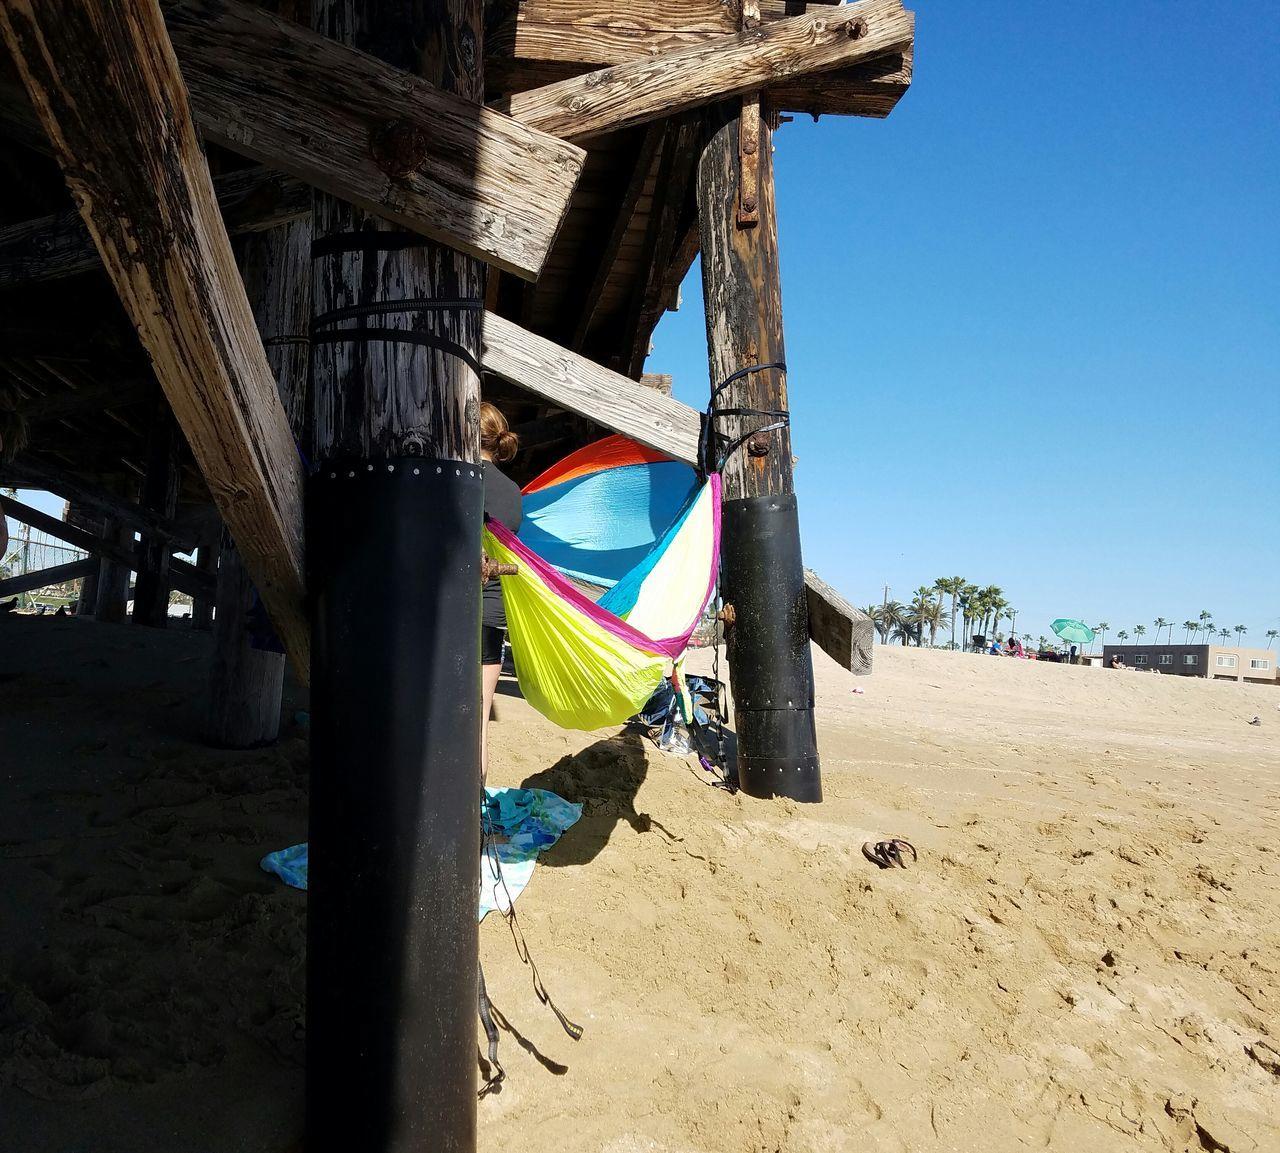 Natural Light Sand Hammock Beach Multi Colored Outdoors EyeEm Best Shots Beauty In Nature Sand Fine Art Photography Copy Space Simplicity Shoreline Beach Backgrounds Meditation Restibg Ocean Simple Pier Nature